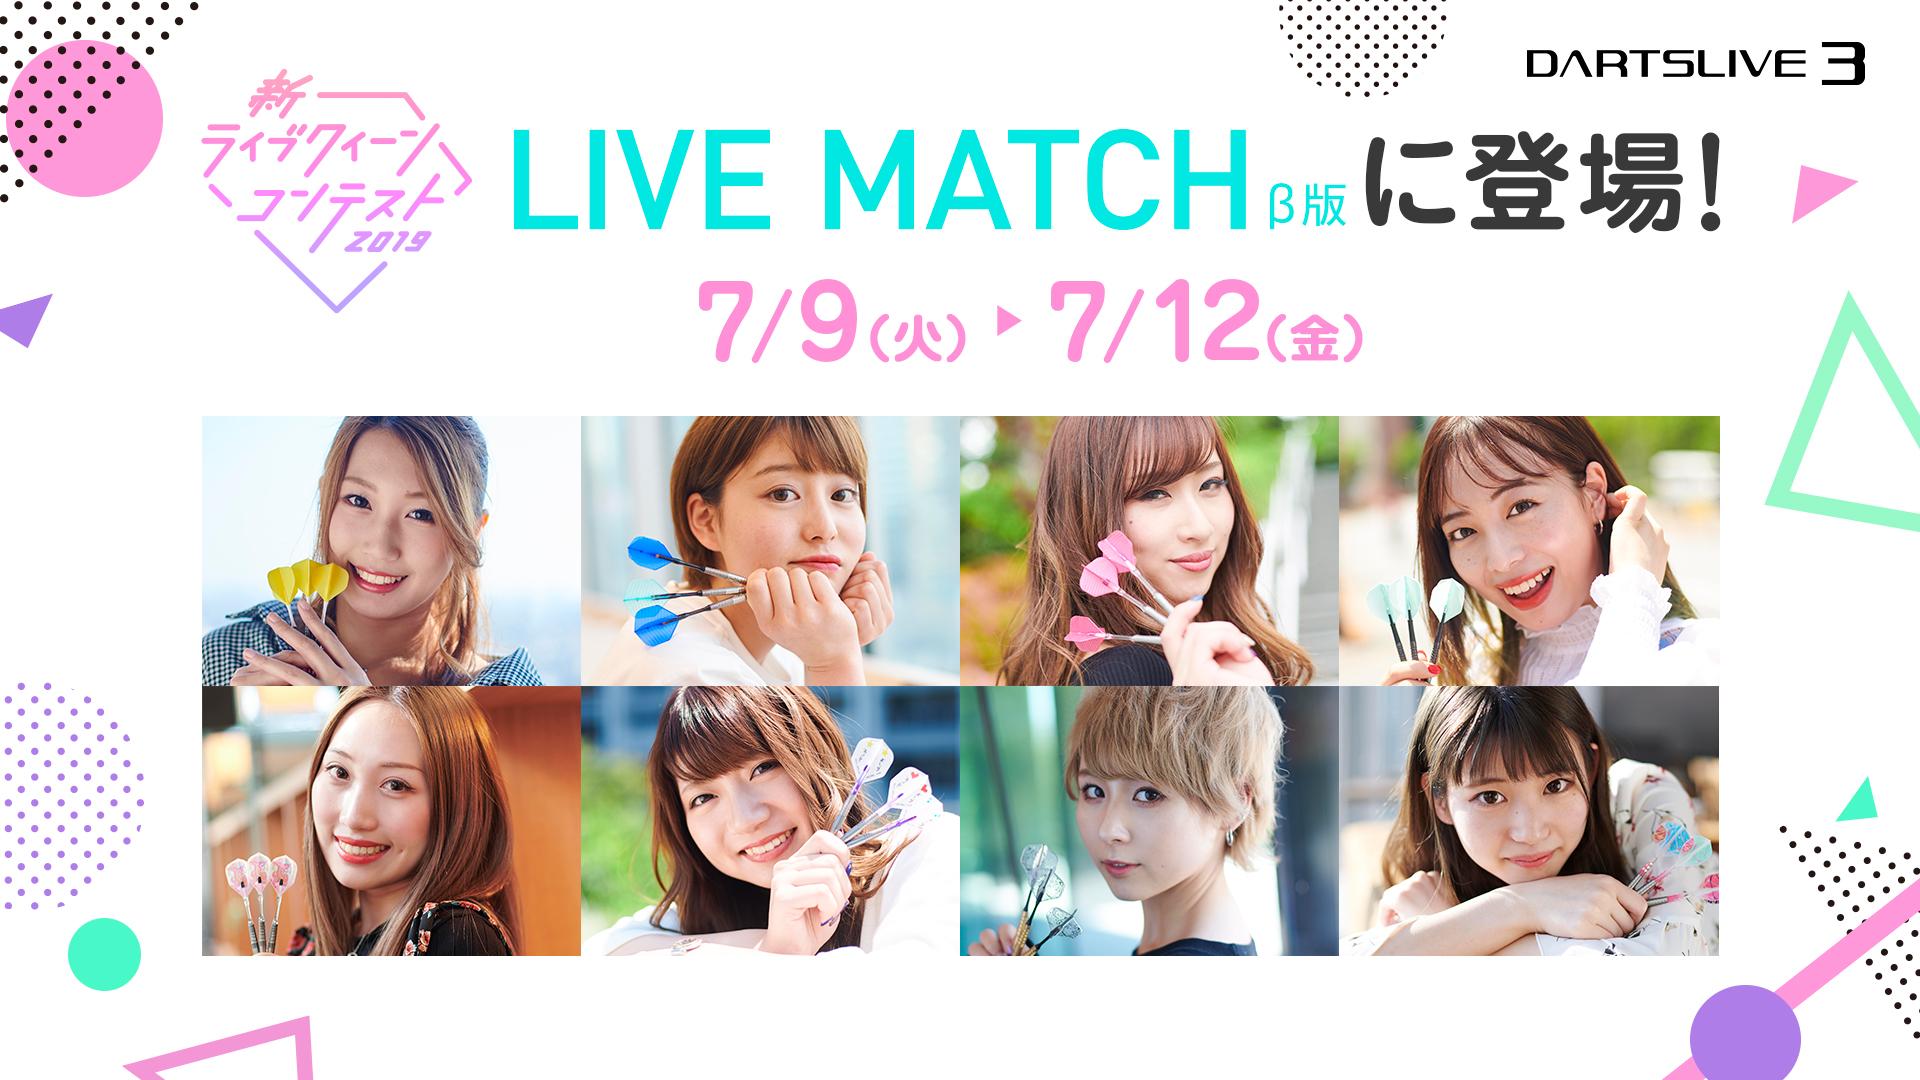 【DARTSLIVE3】LIVE MATCHに新ライブクイーン候補者が参戦決定!